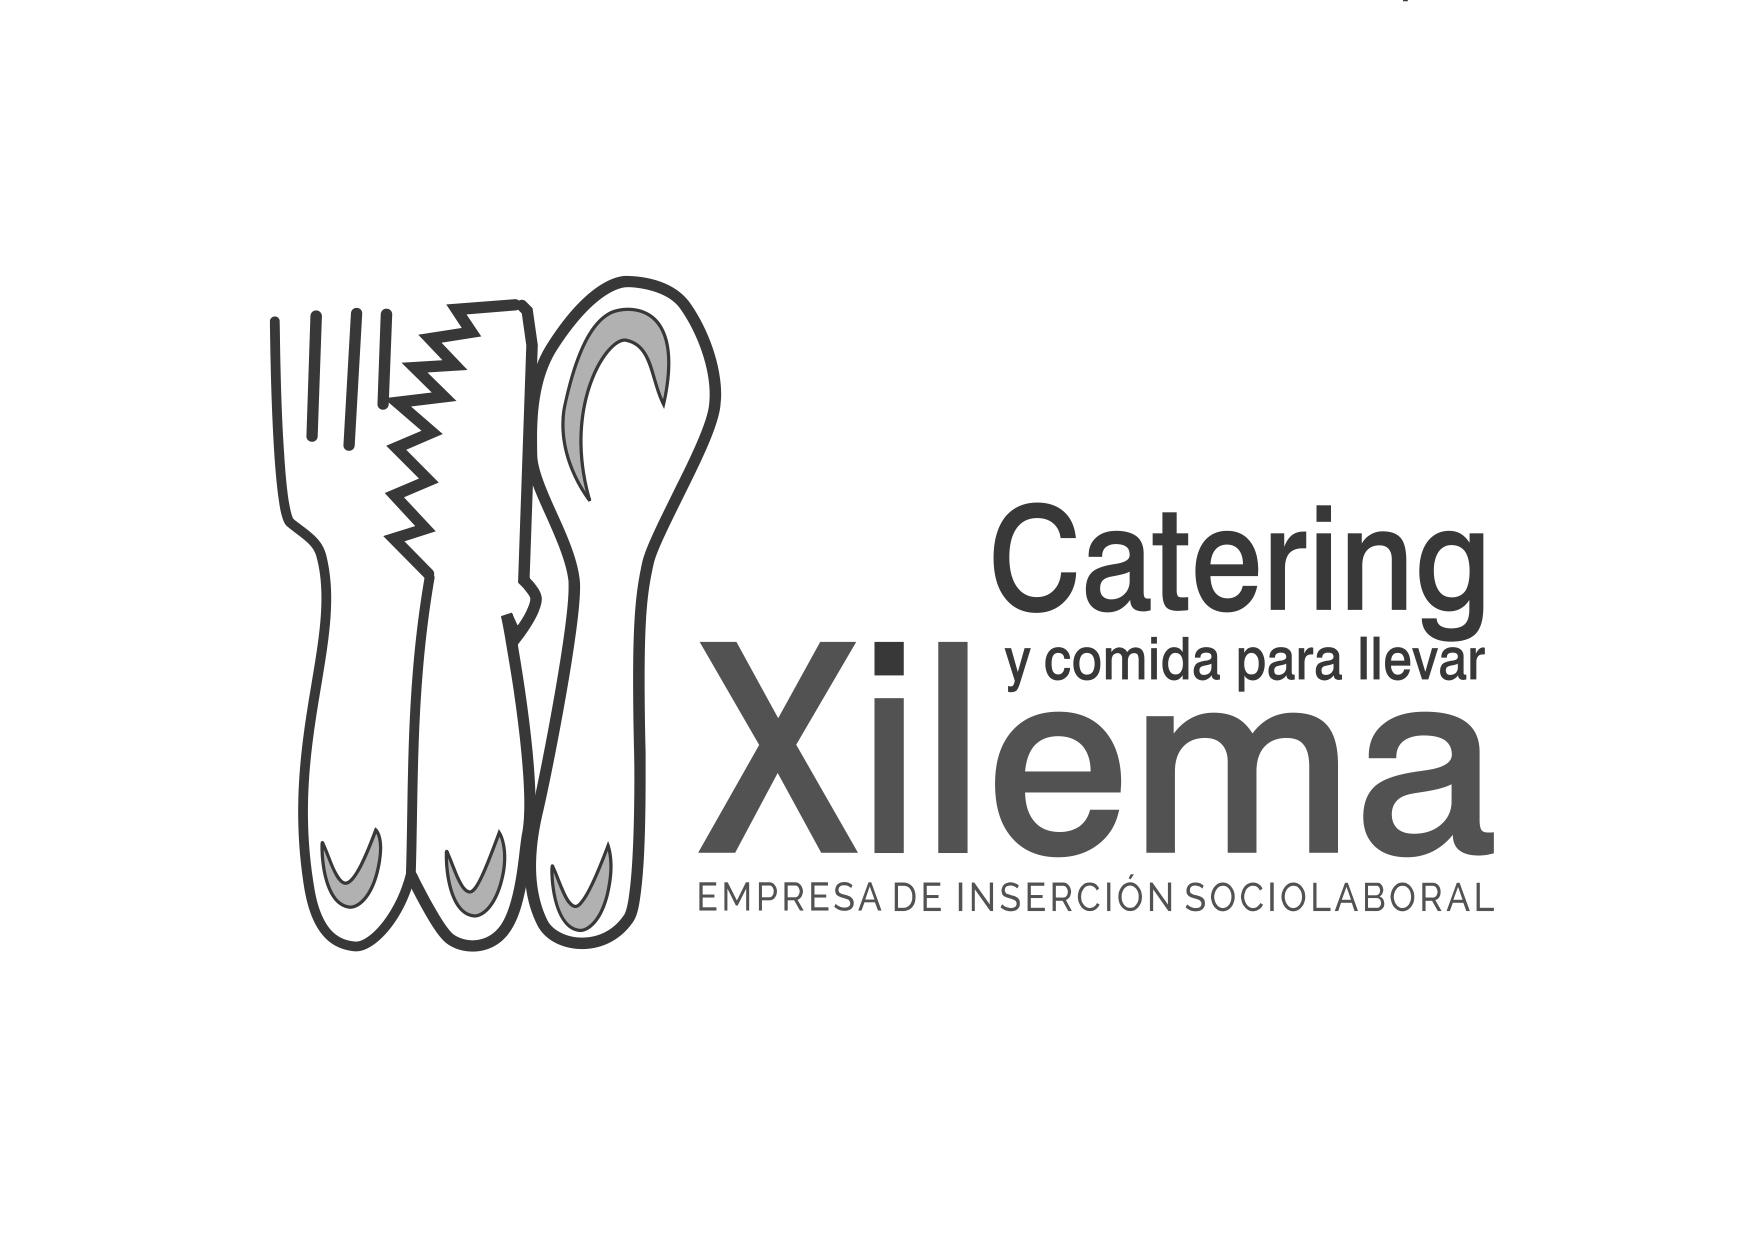 Logo Xilema Catering